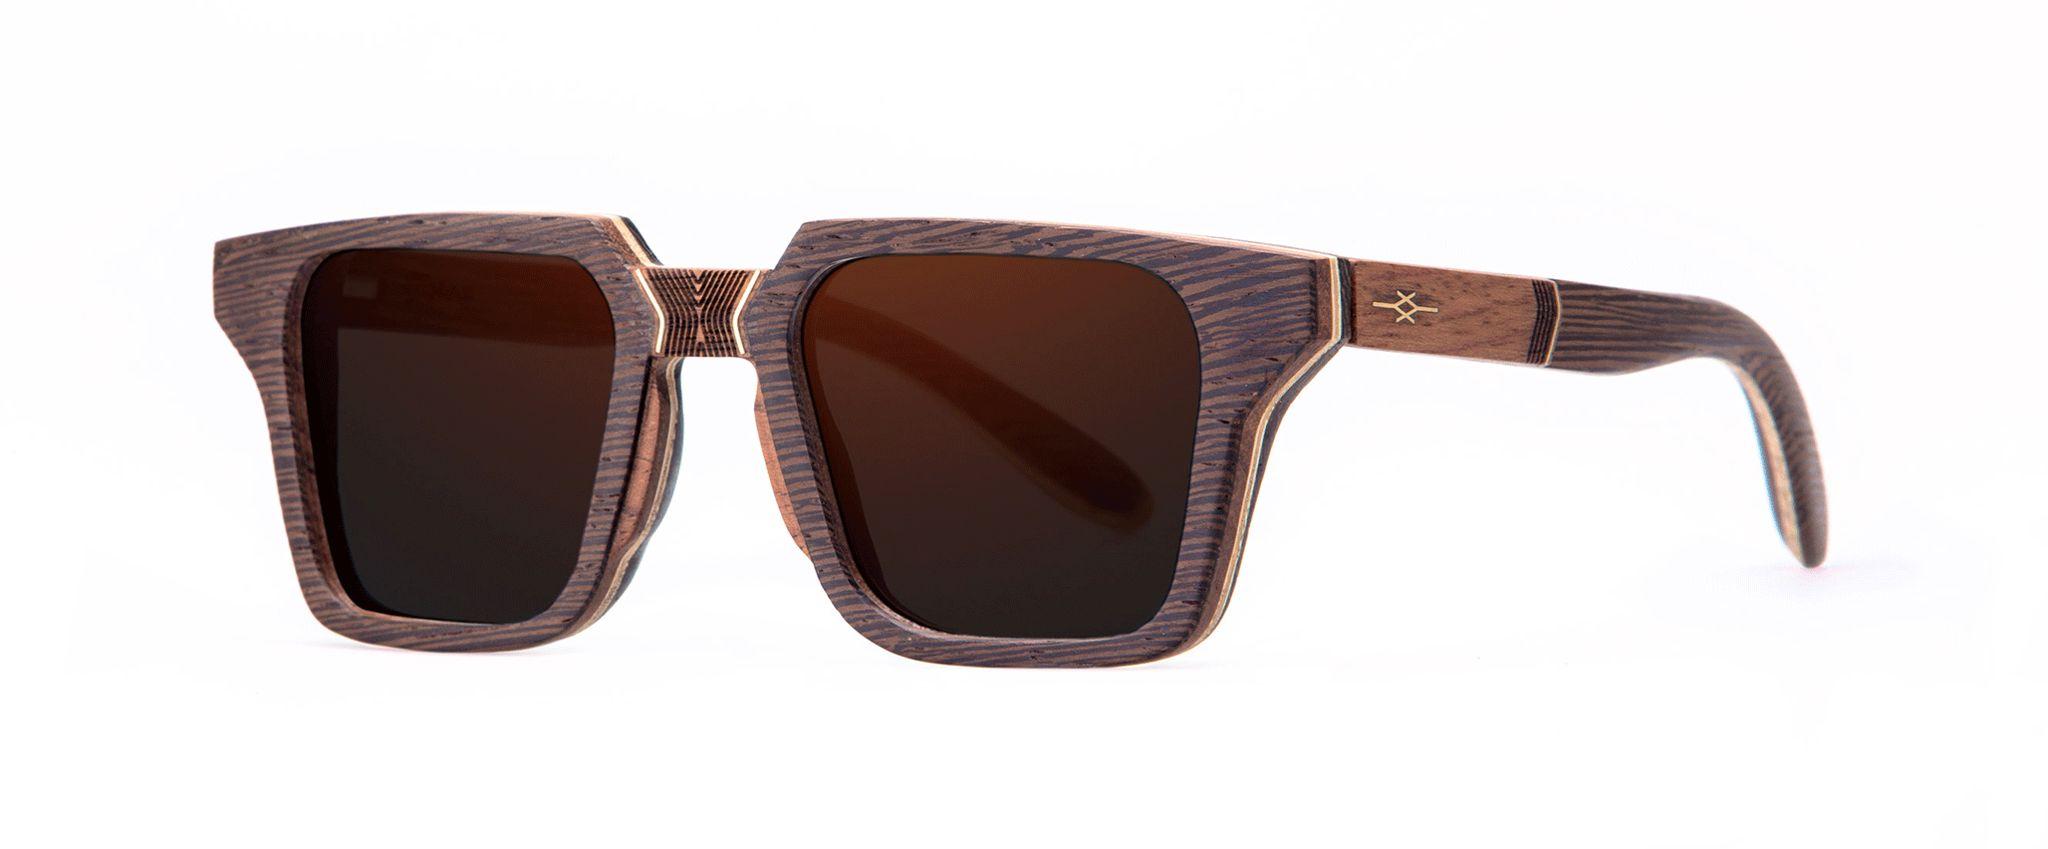 Totem Vakay designer sunglasses Wenge